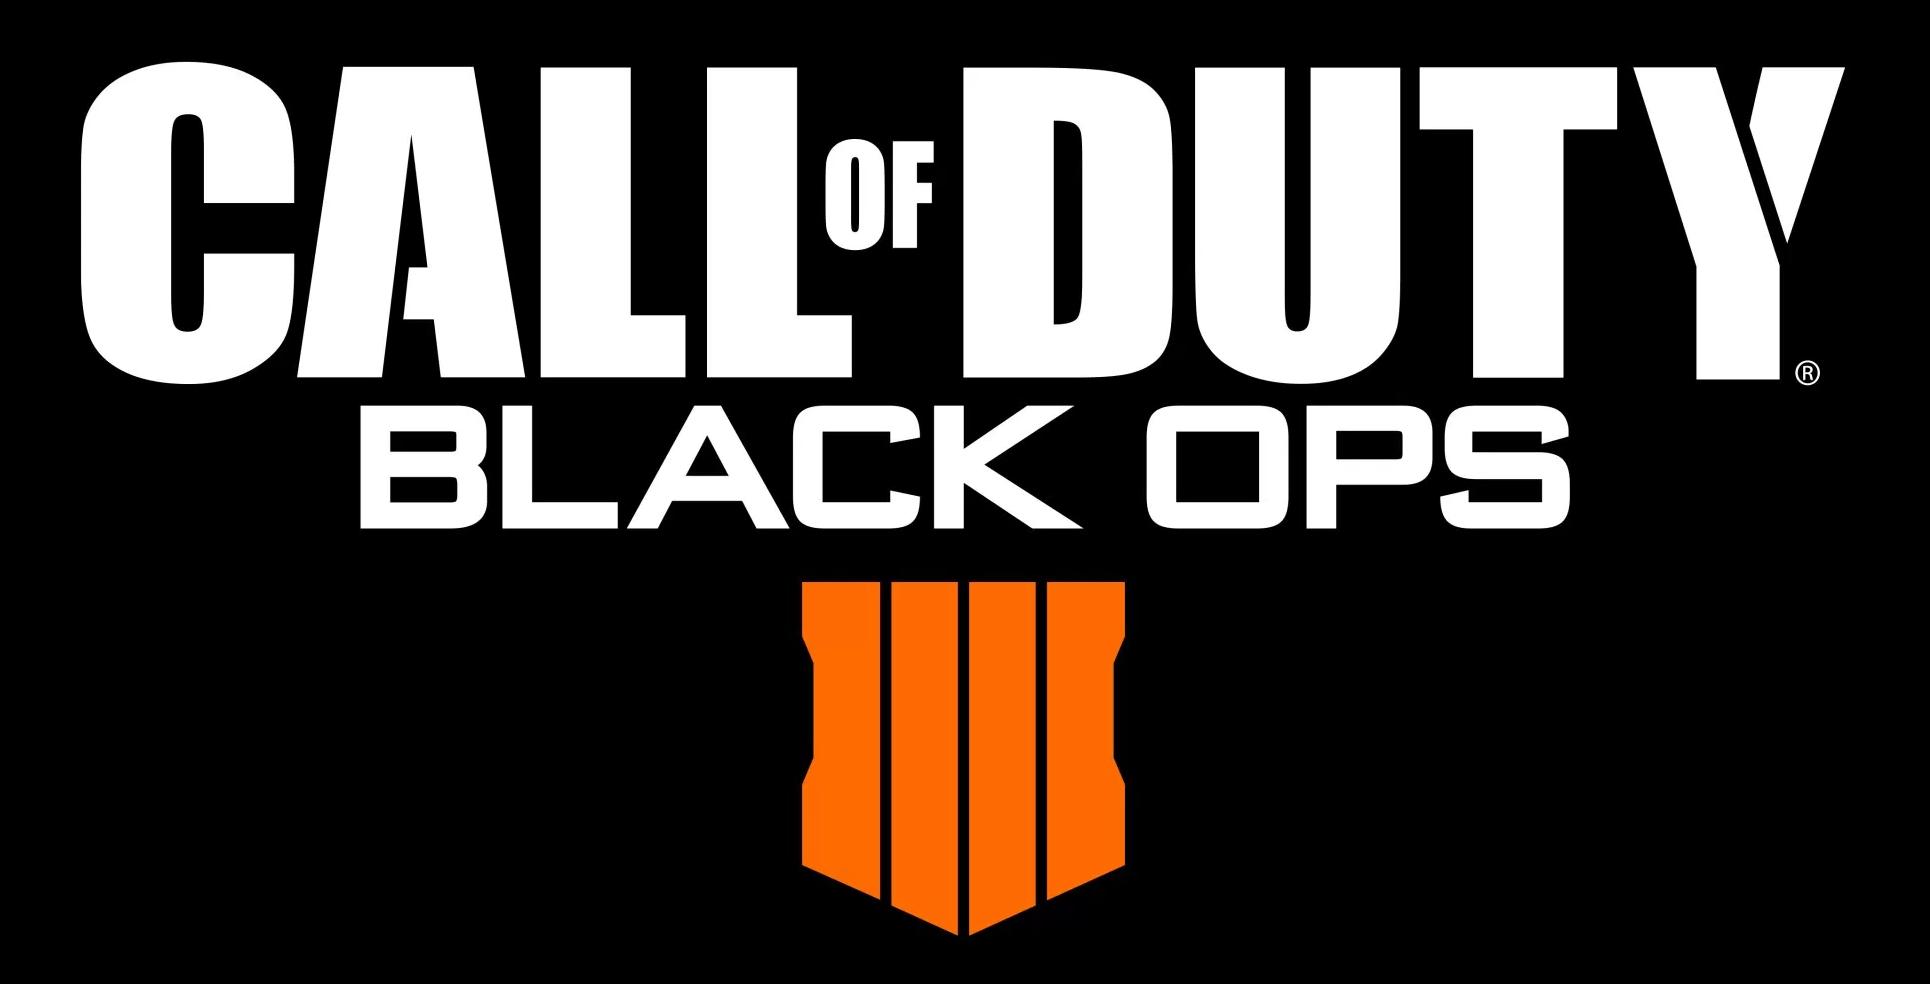 Bo4 Logo (Call Of Duty Black Ops 4) Vector EPS Free Download, Logo.